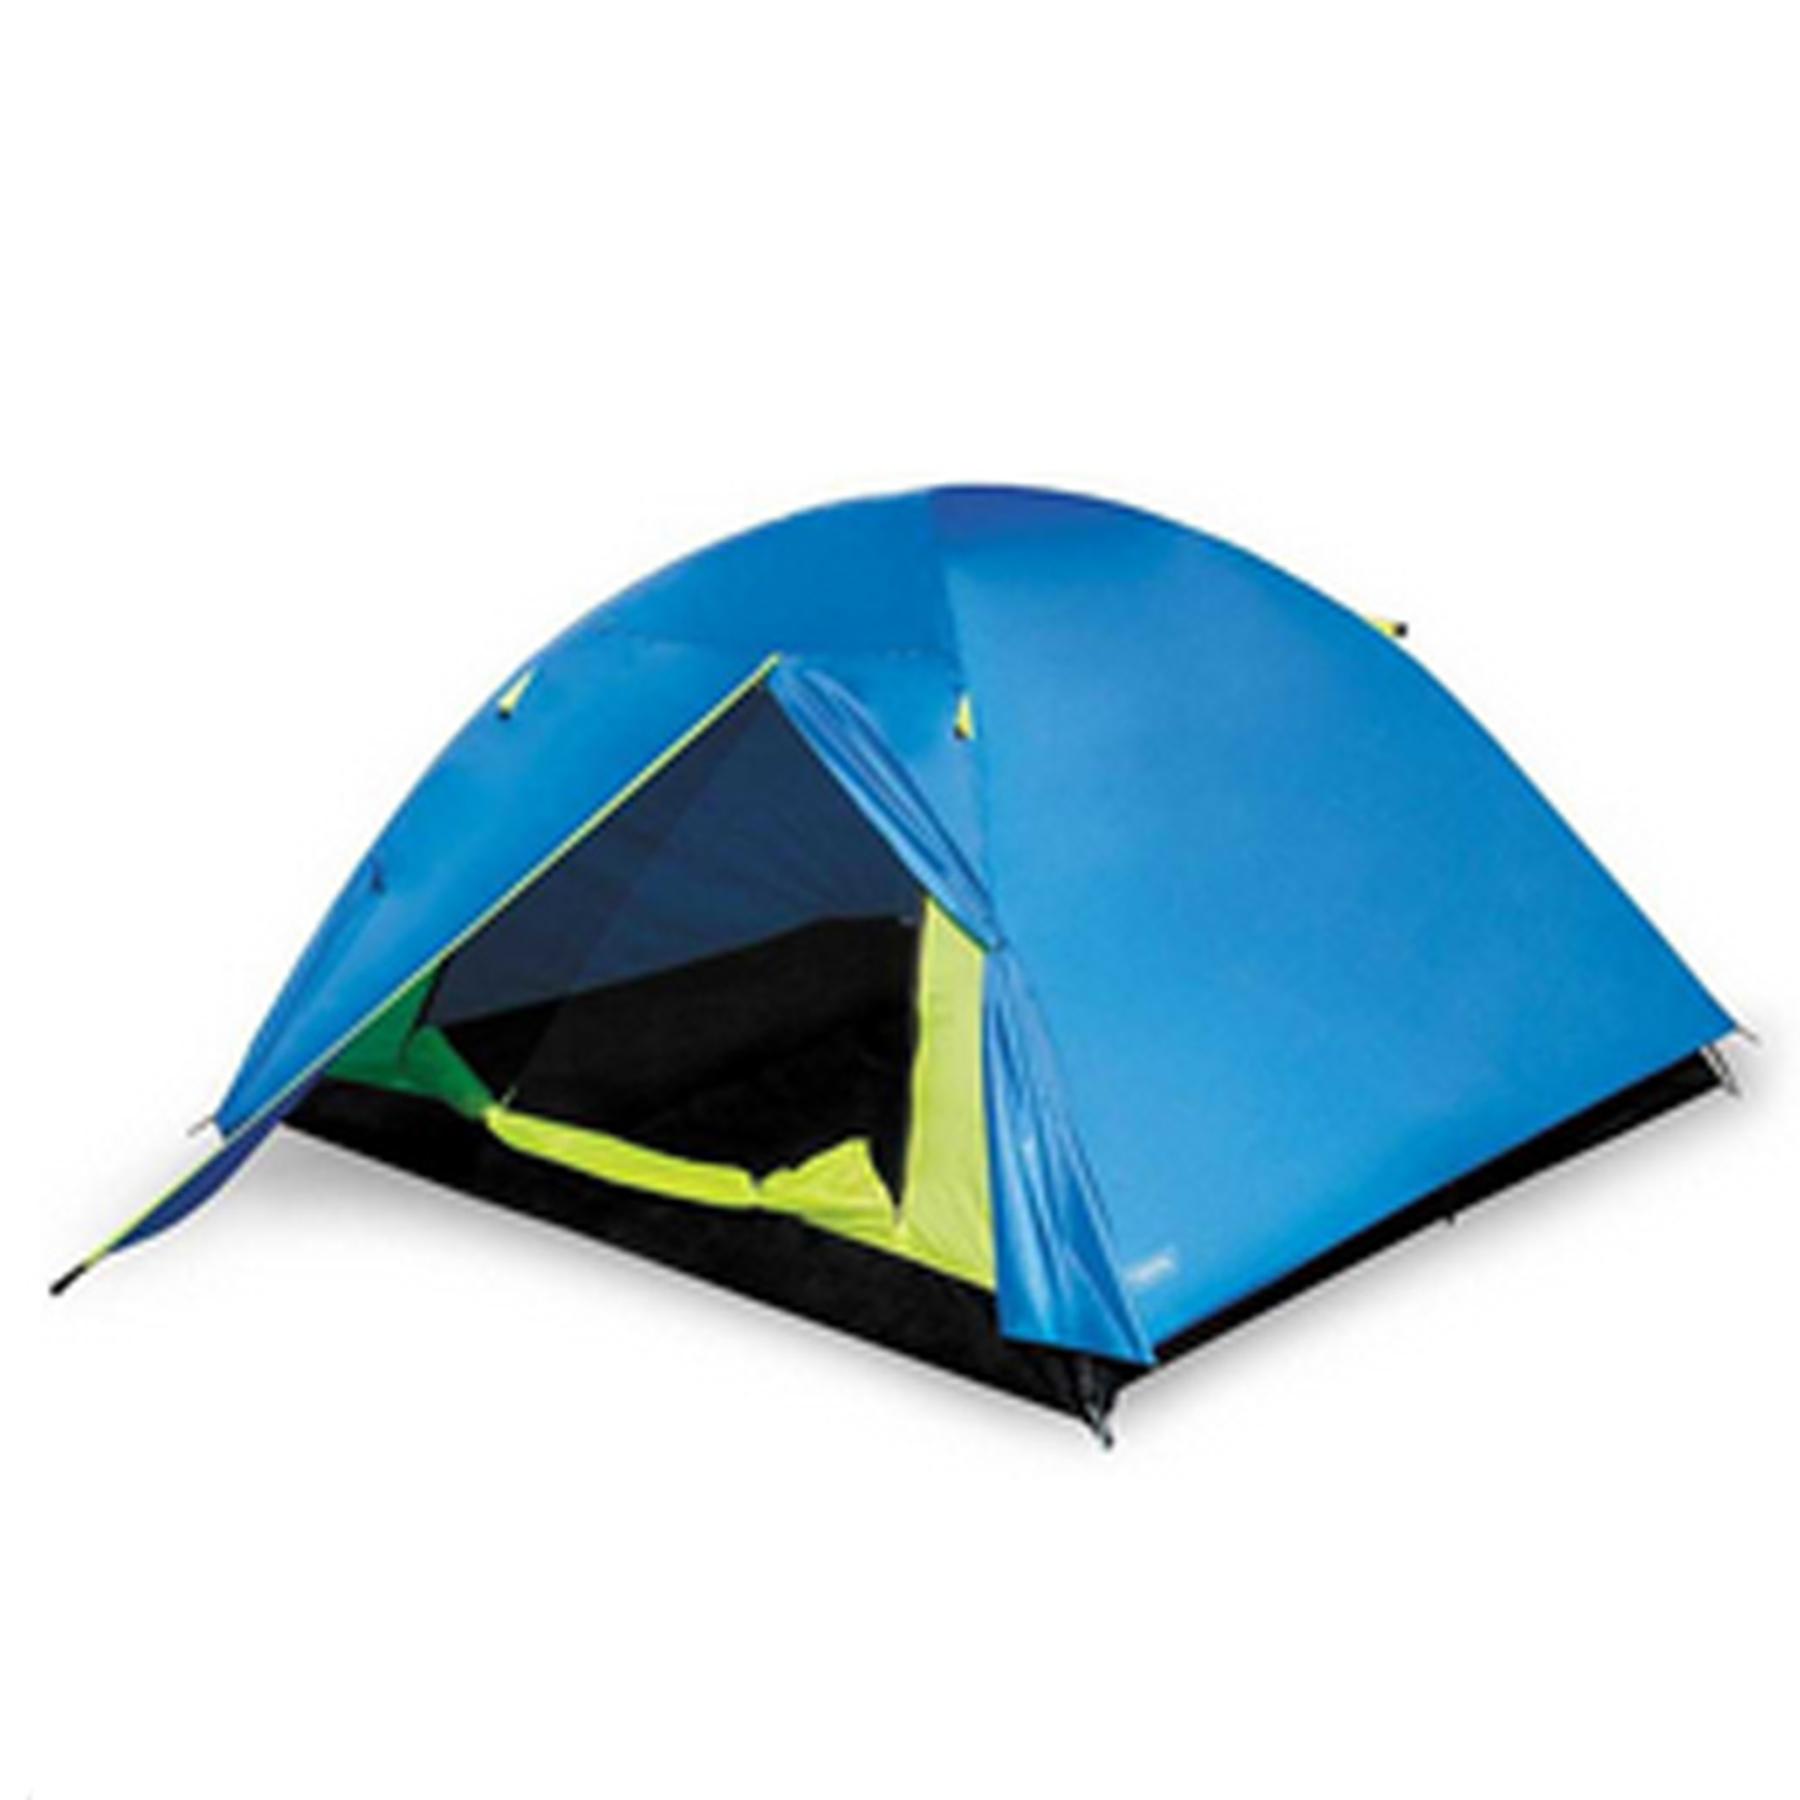 Палатка АТ NOV Canyon 4 (3,66 кг, водост. 1000 мм, 280*240см h-130см)